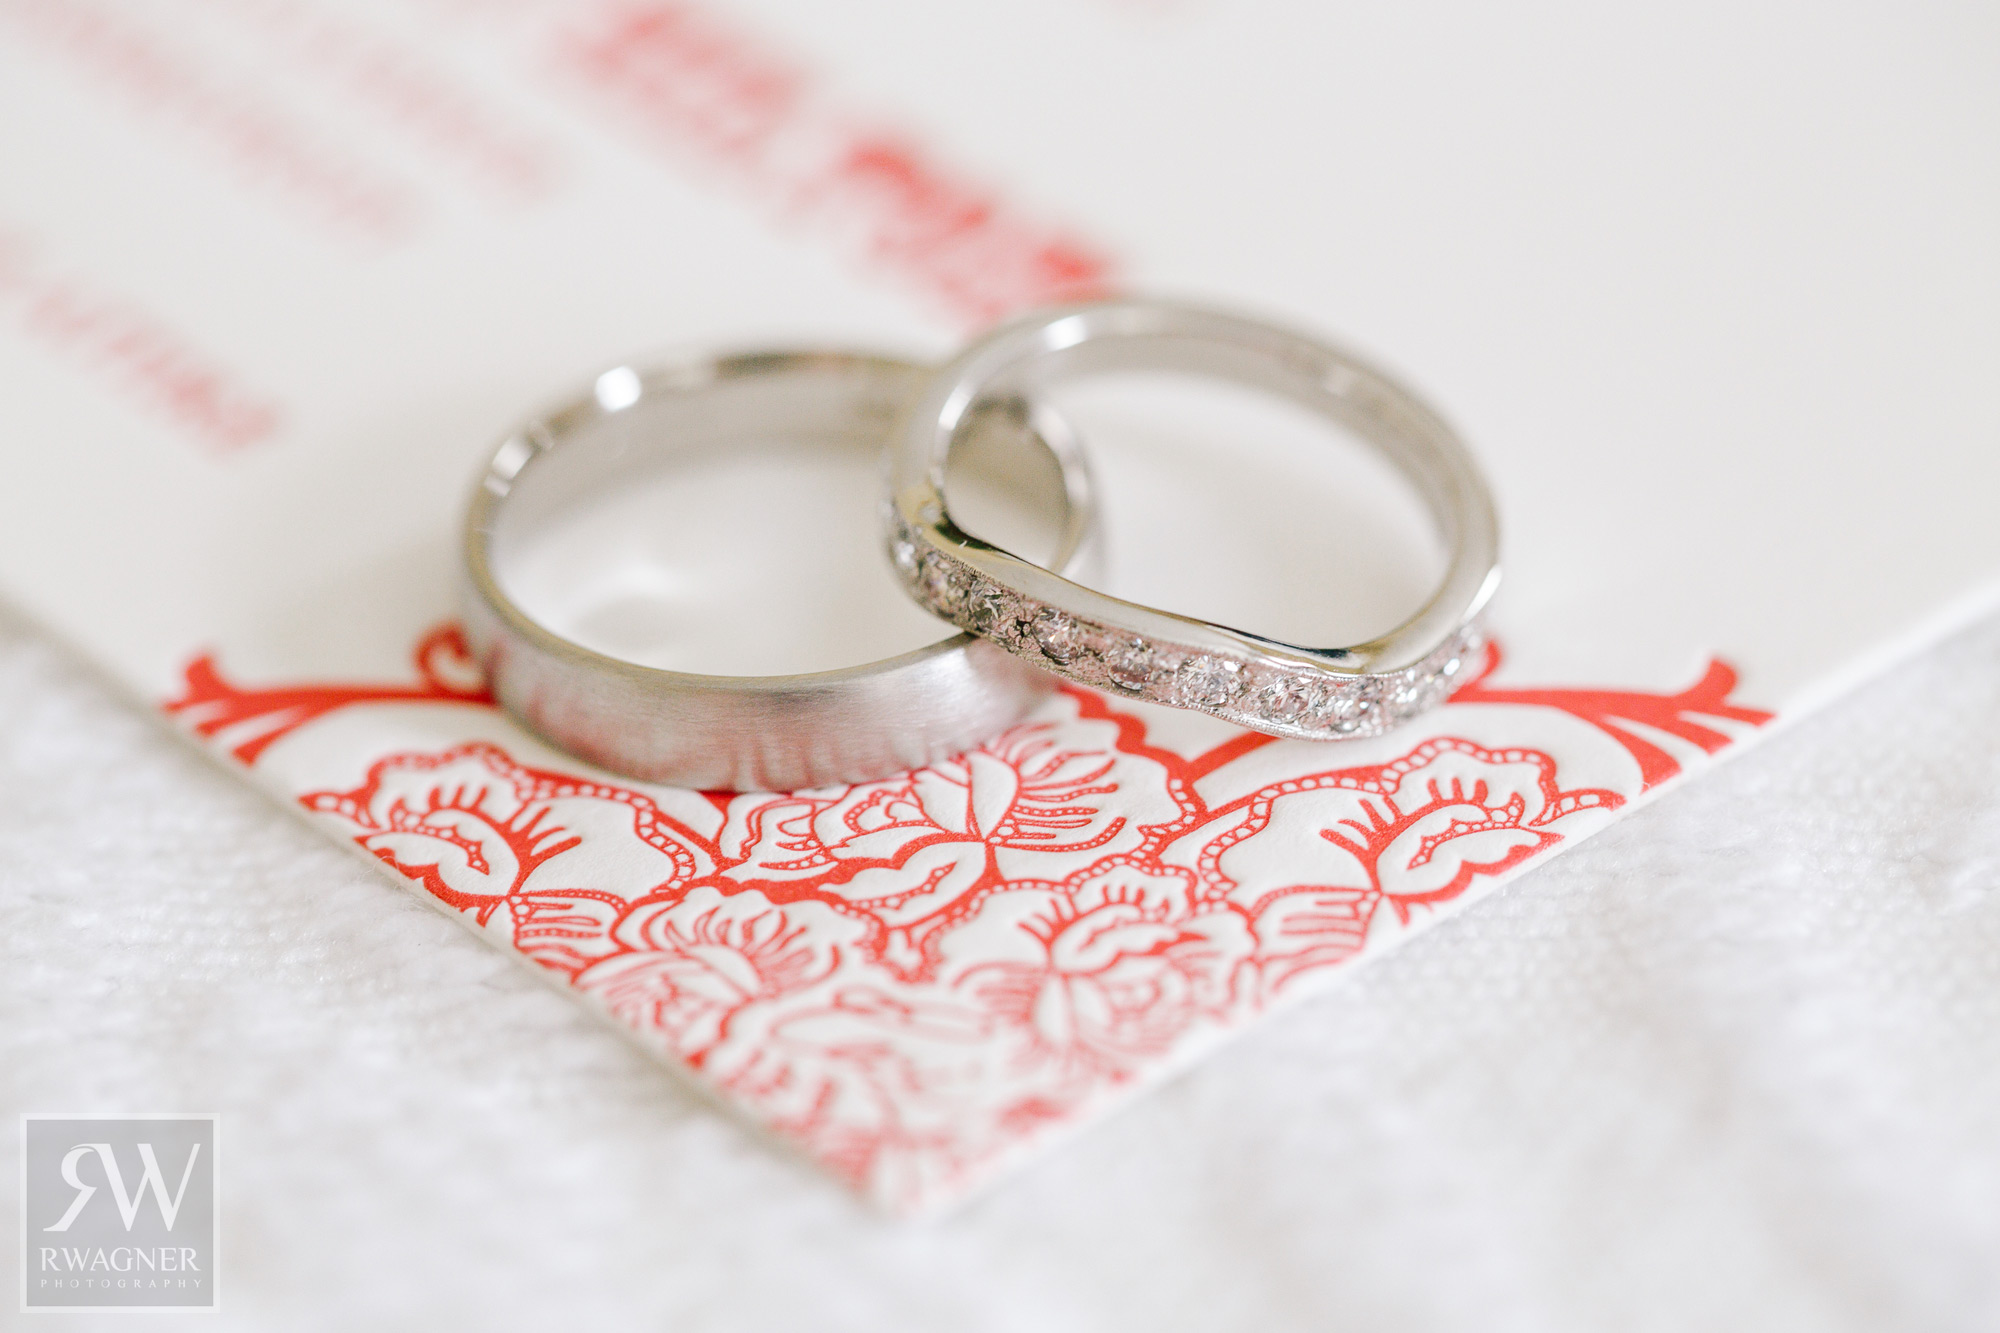 ceci_new_york_luxury_wedding_invitations_couture_red_black_white_real_wedding_dramatic_inn_at_longshore_v286_8.jpg